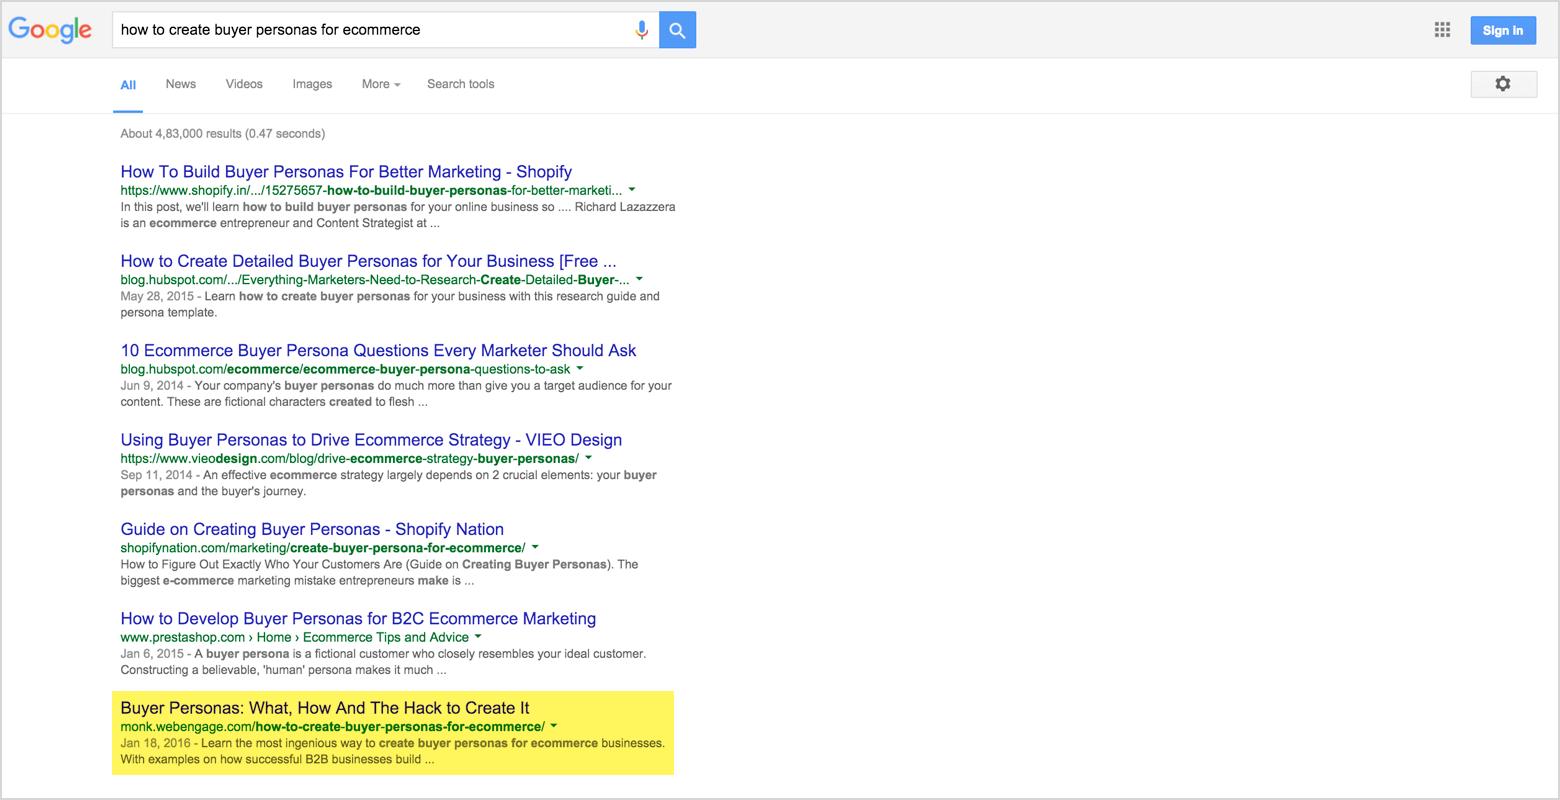 webengage monk ranking on google search